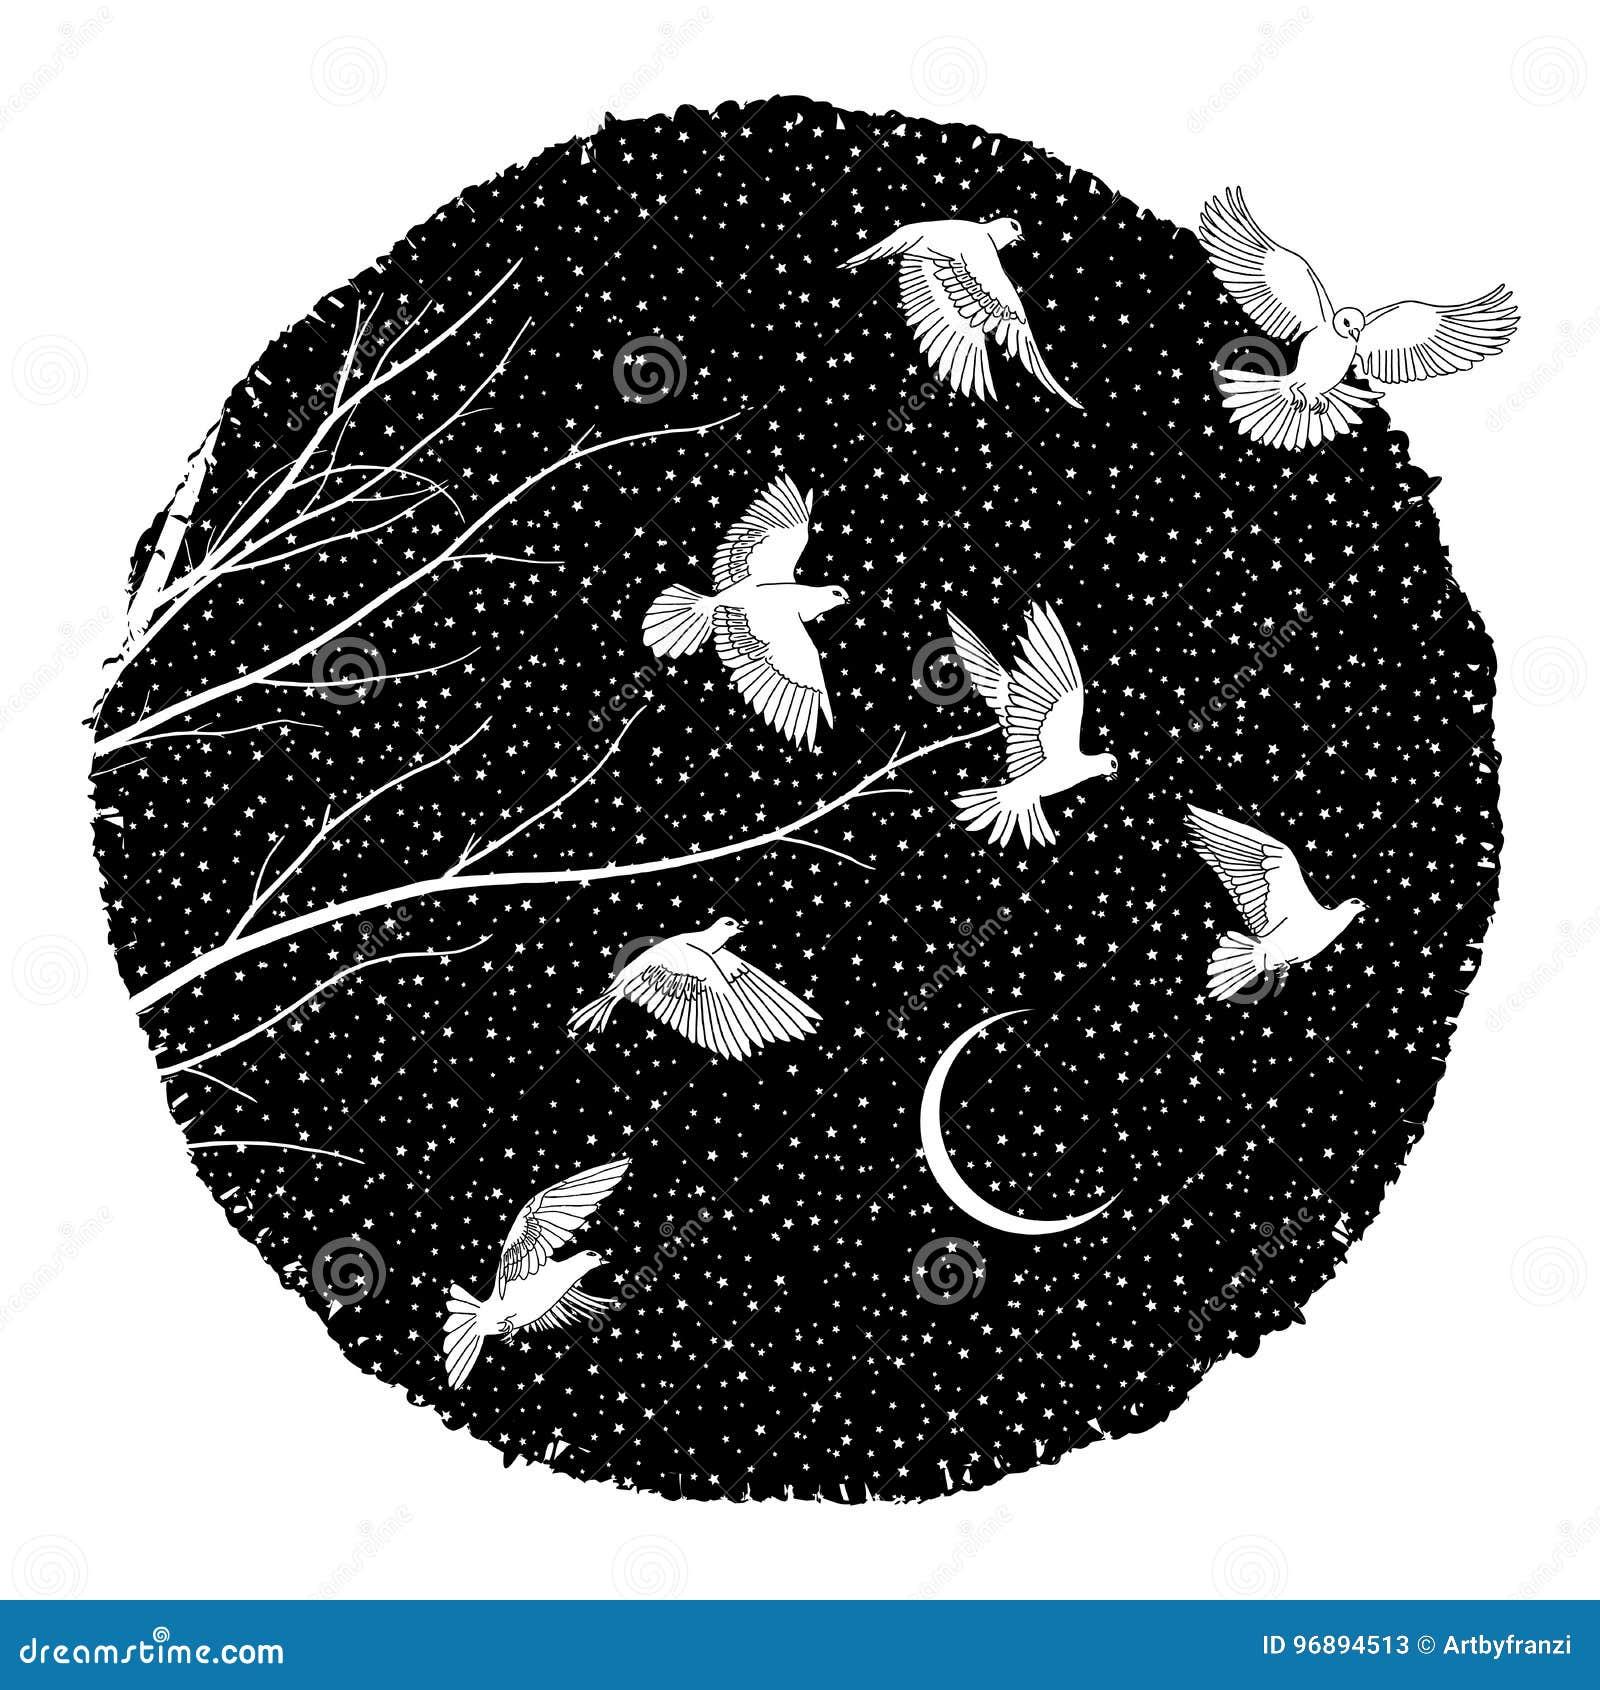 Witte Duiven bij nacht